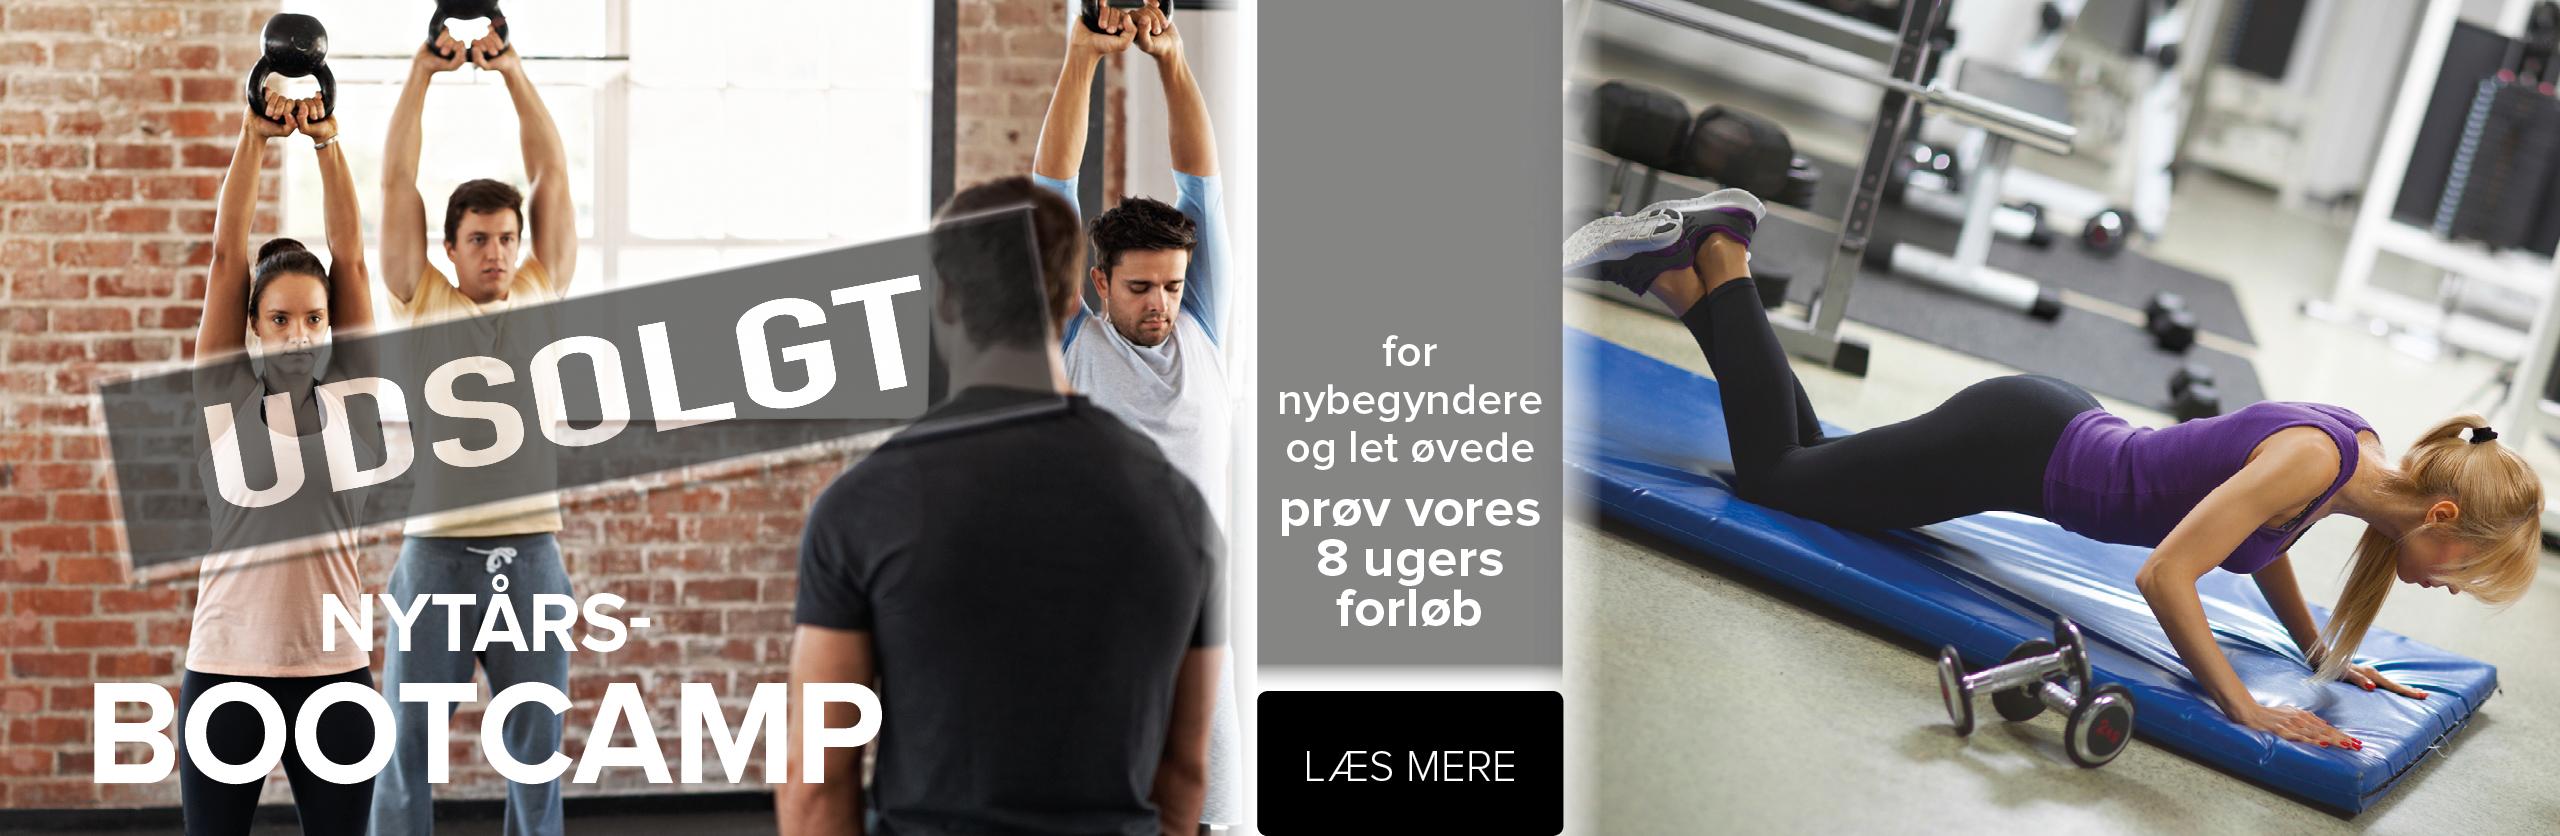 NYTÅRS-BOOTCAMP 2018